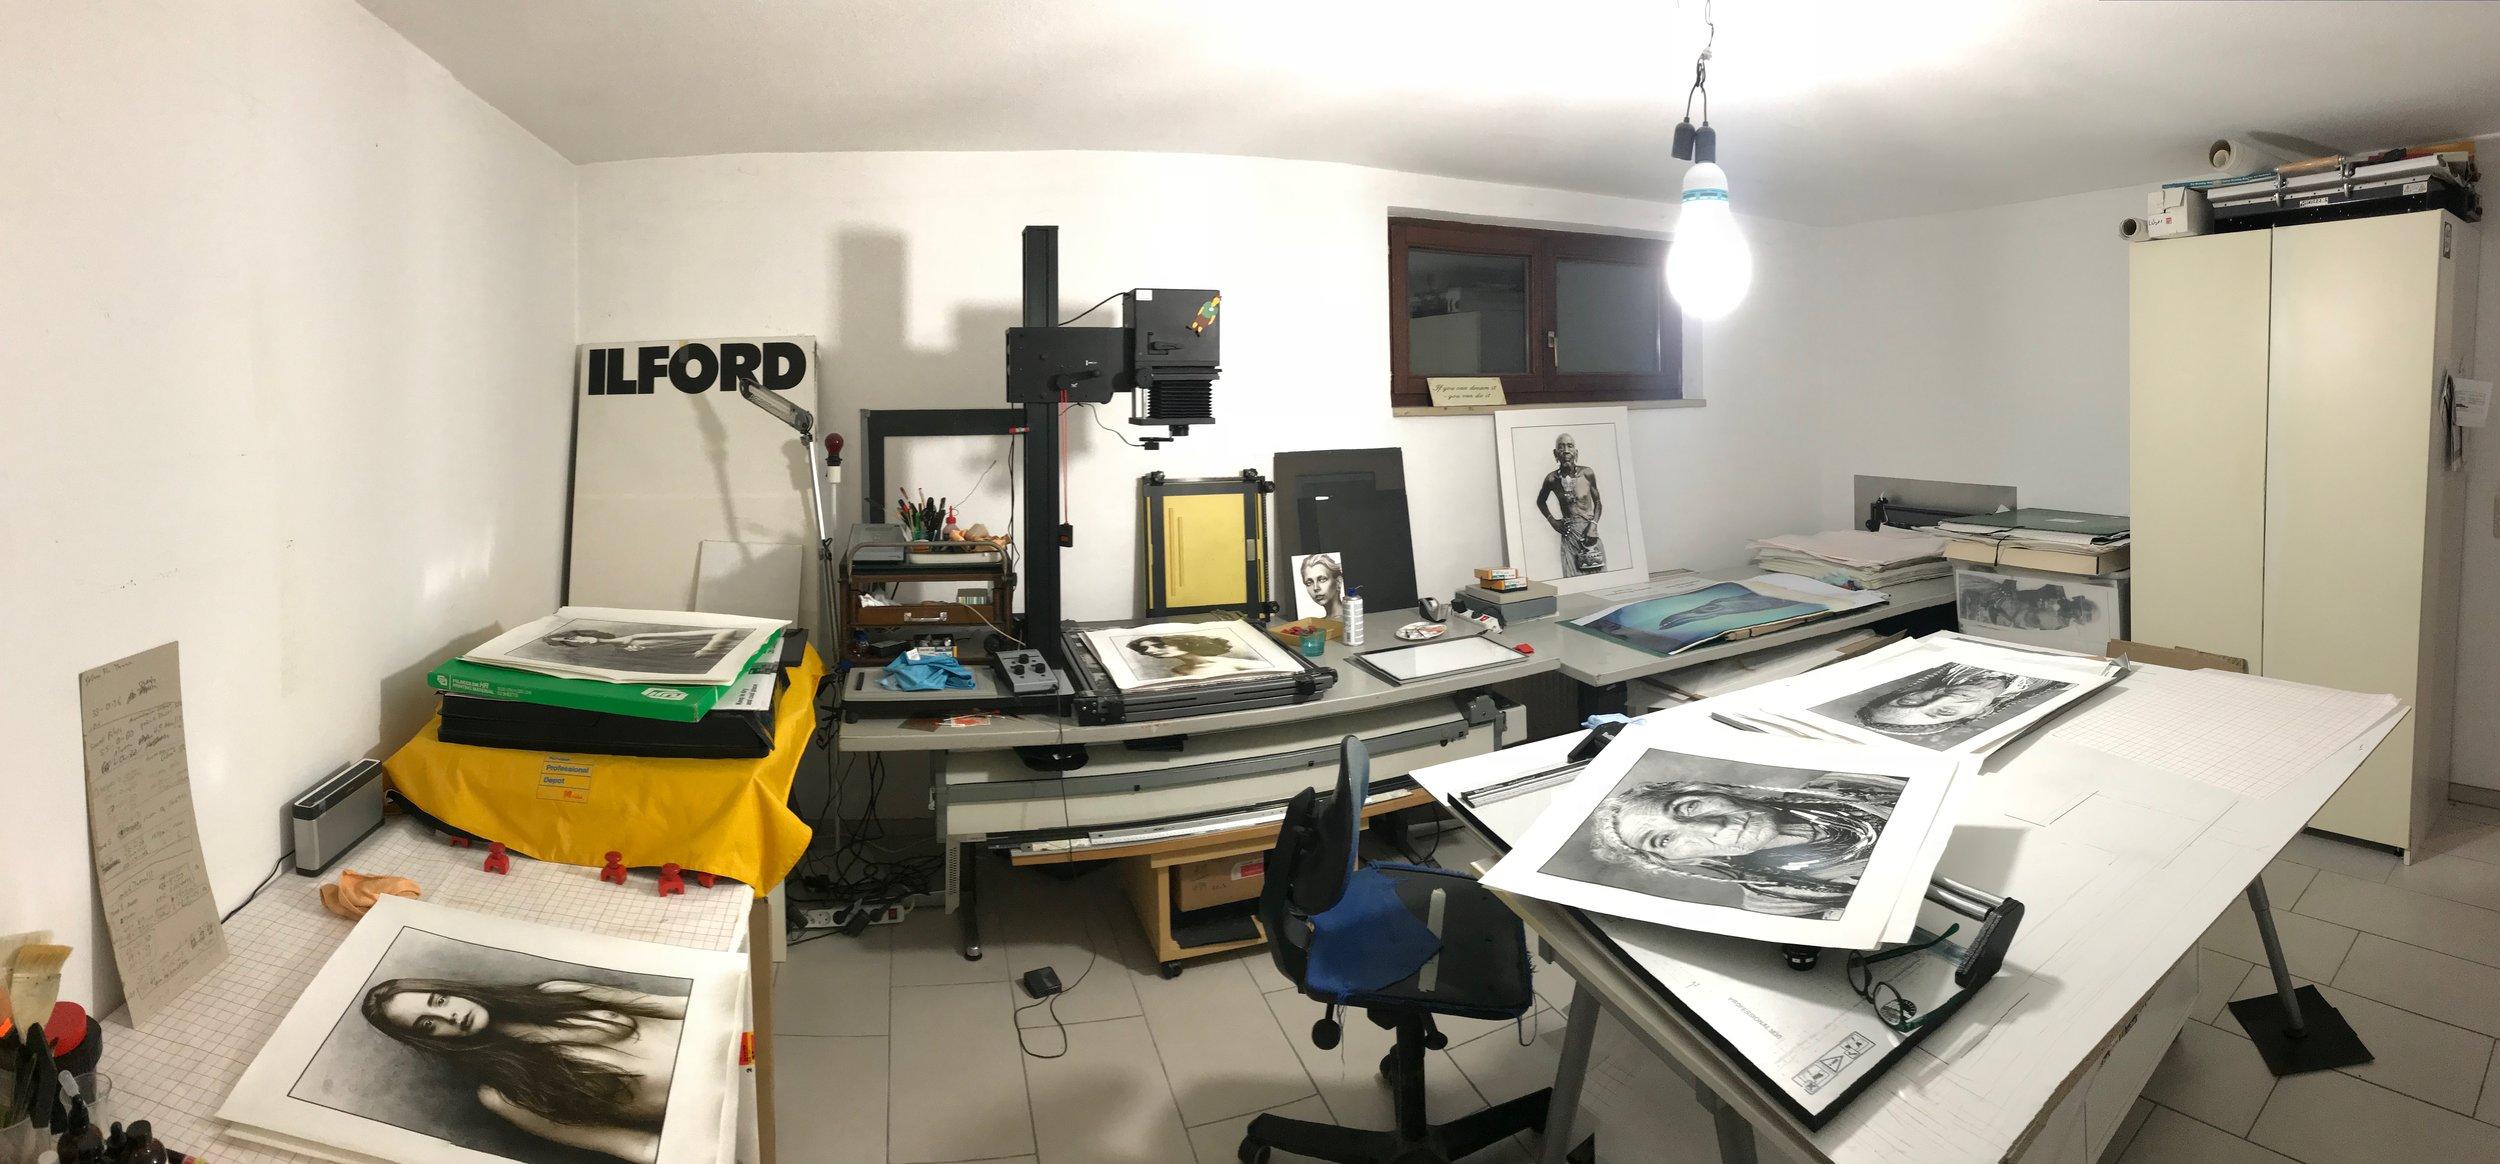 Jan_dark_room.jpg